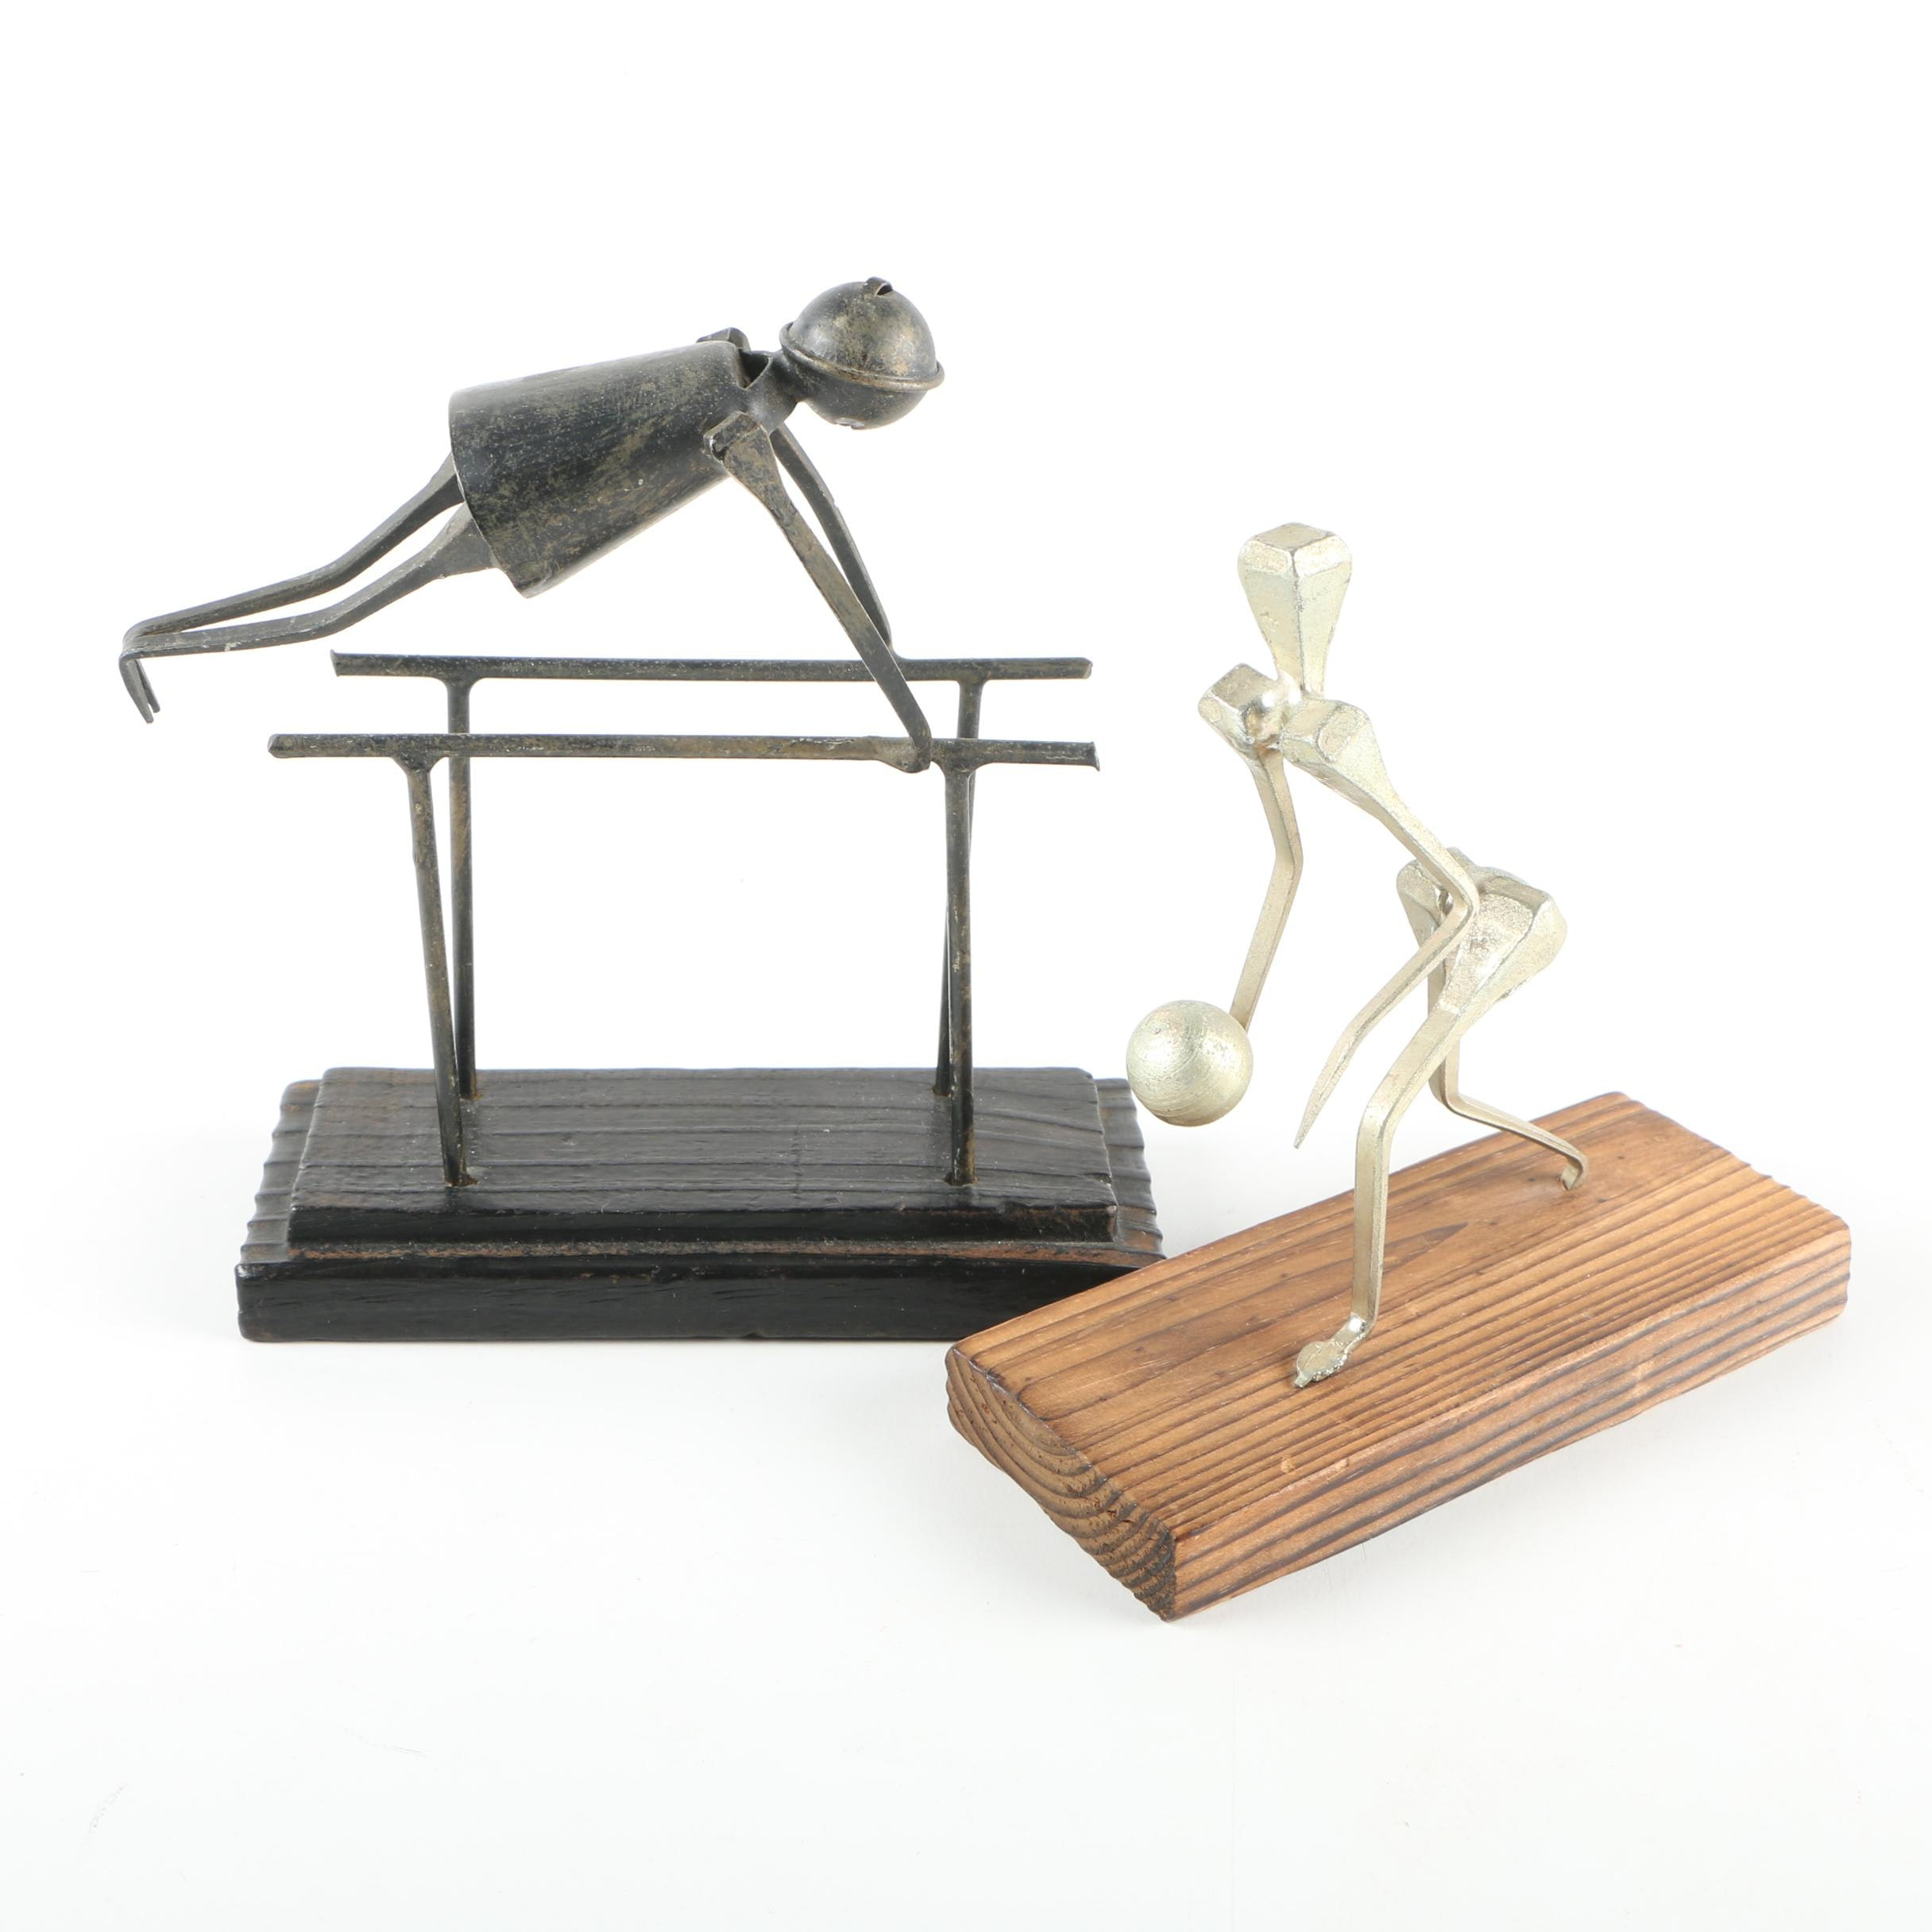 Metal Sports Figurines Made in Spain